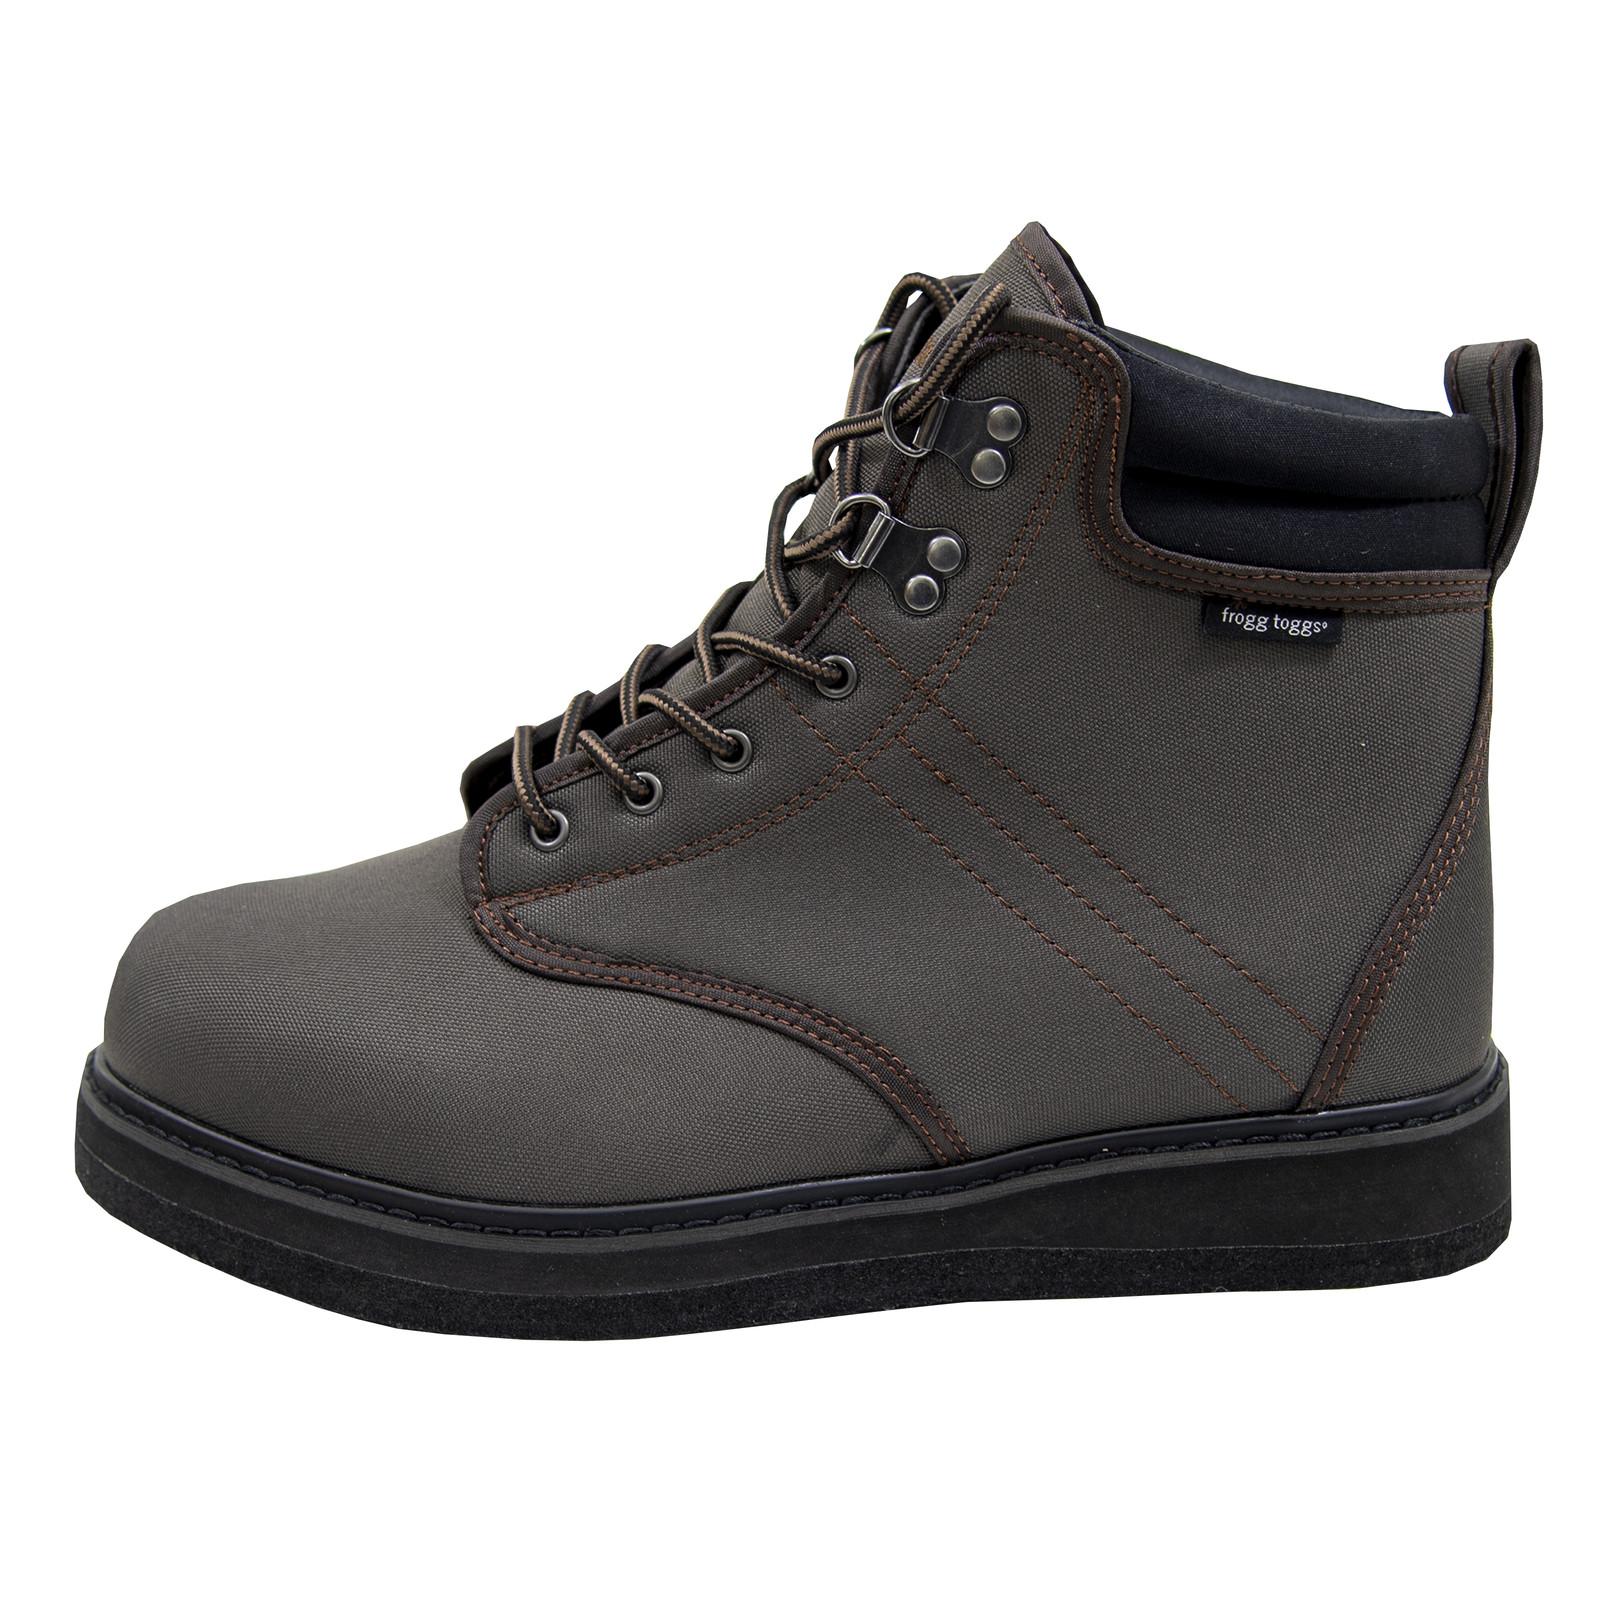 Men's Rana Elite Wading Shoe Felt